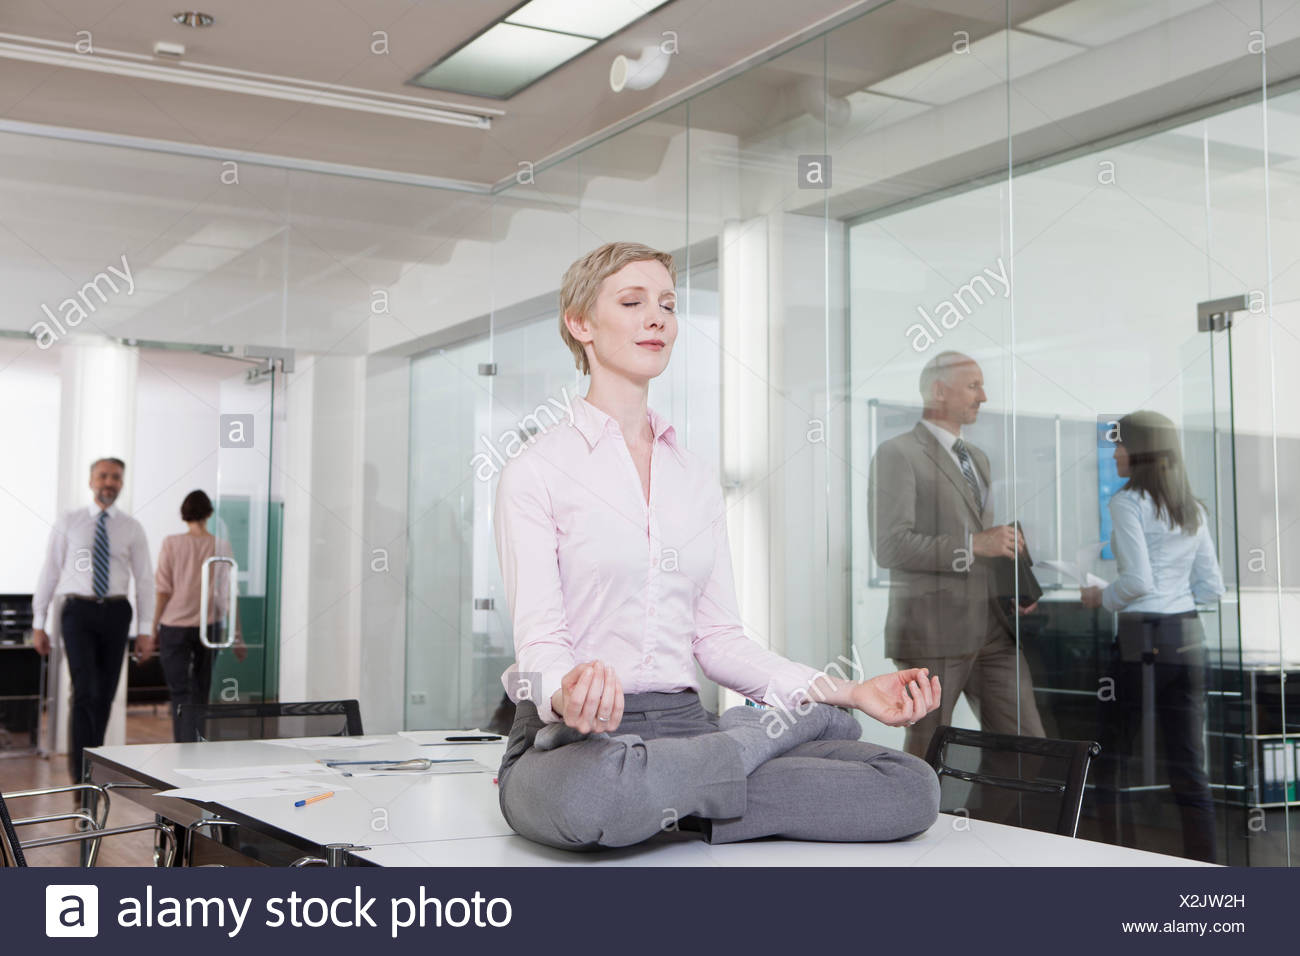 meditation office. Germany, Munich, Businesswoman In Office, Meditating On Desk - Stock Image Meditation Office